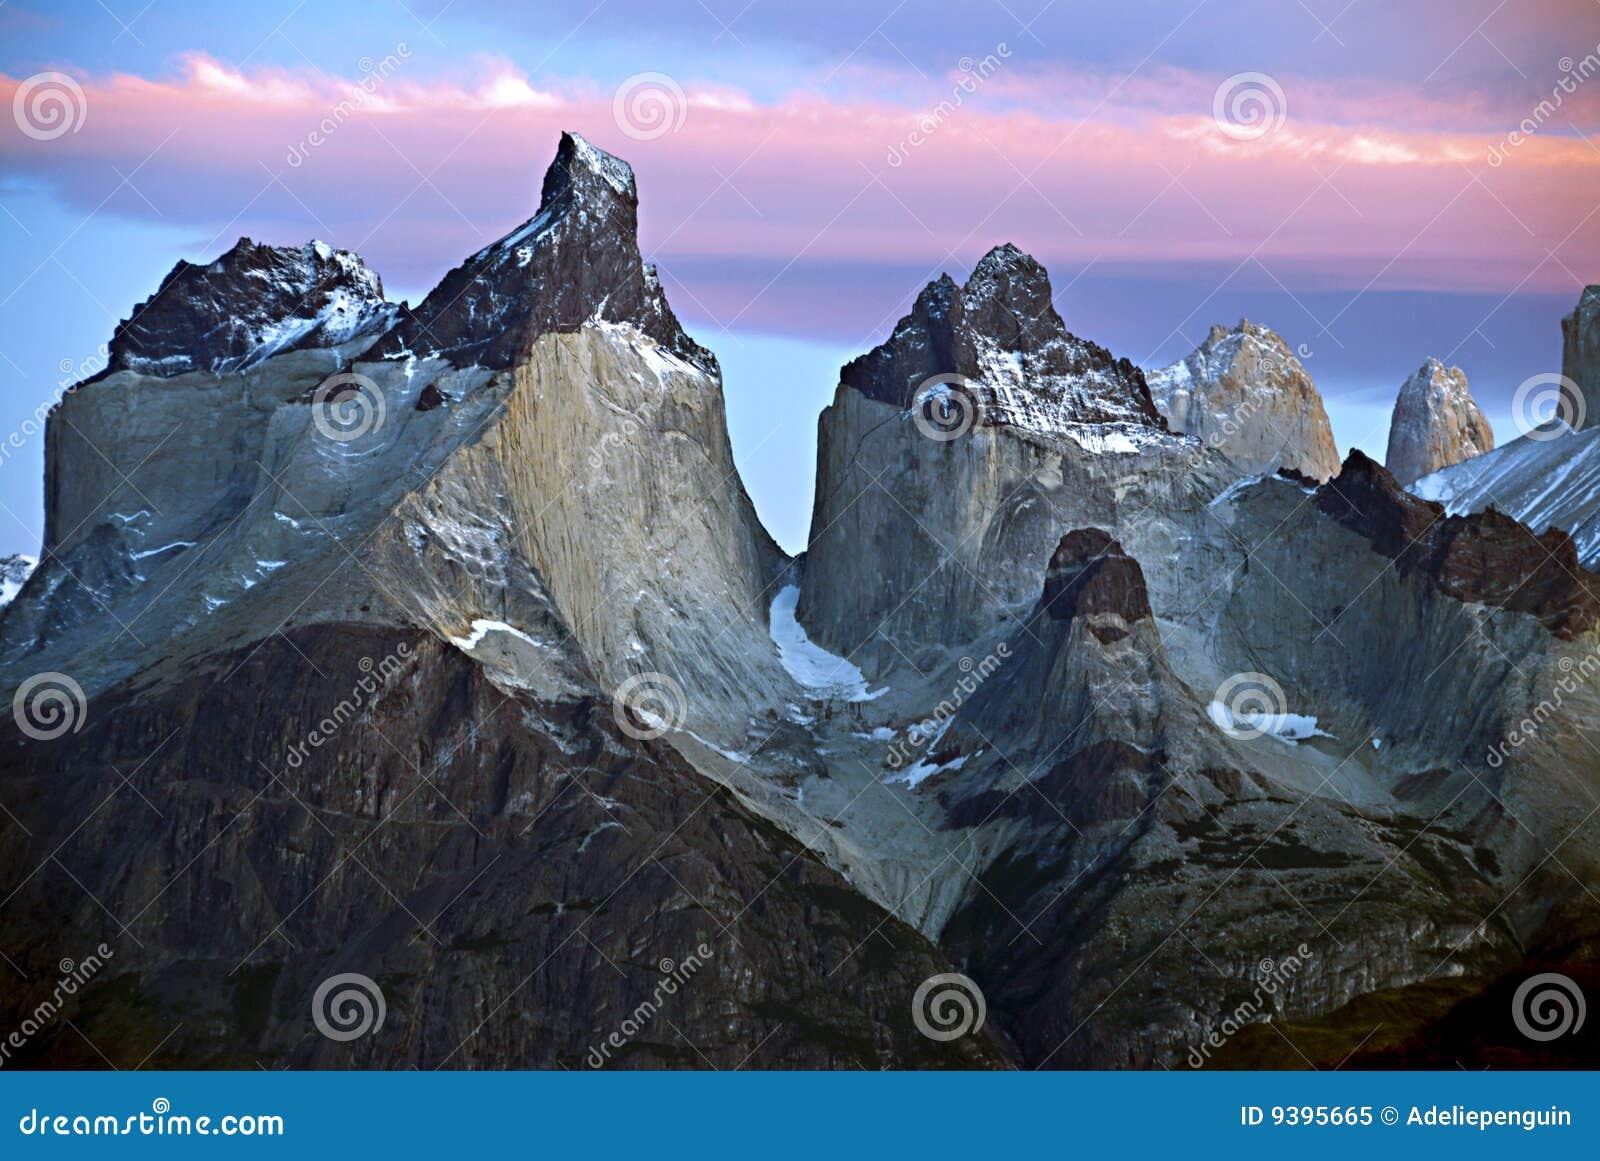 Nascer do sol, Cuernos del Paine